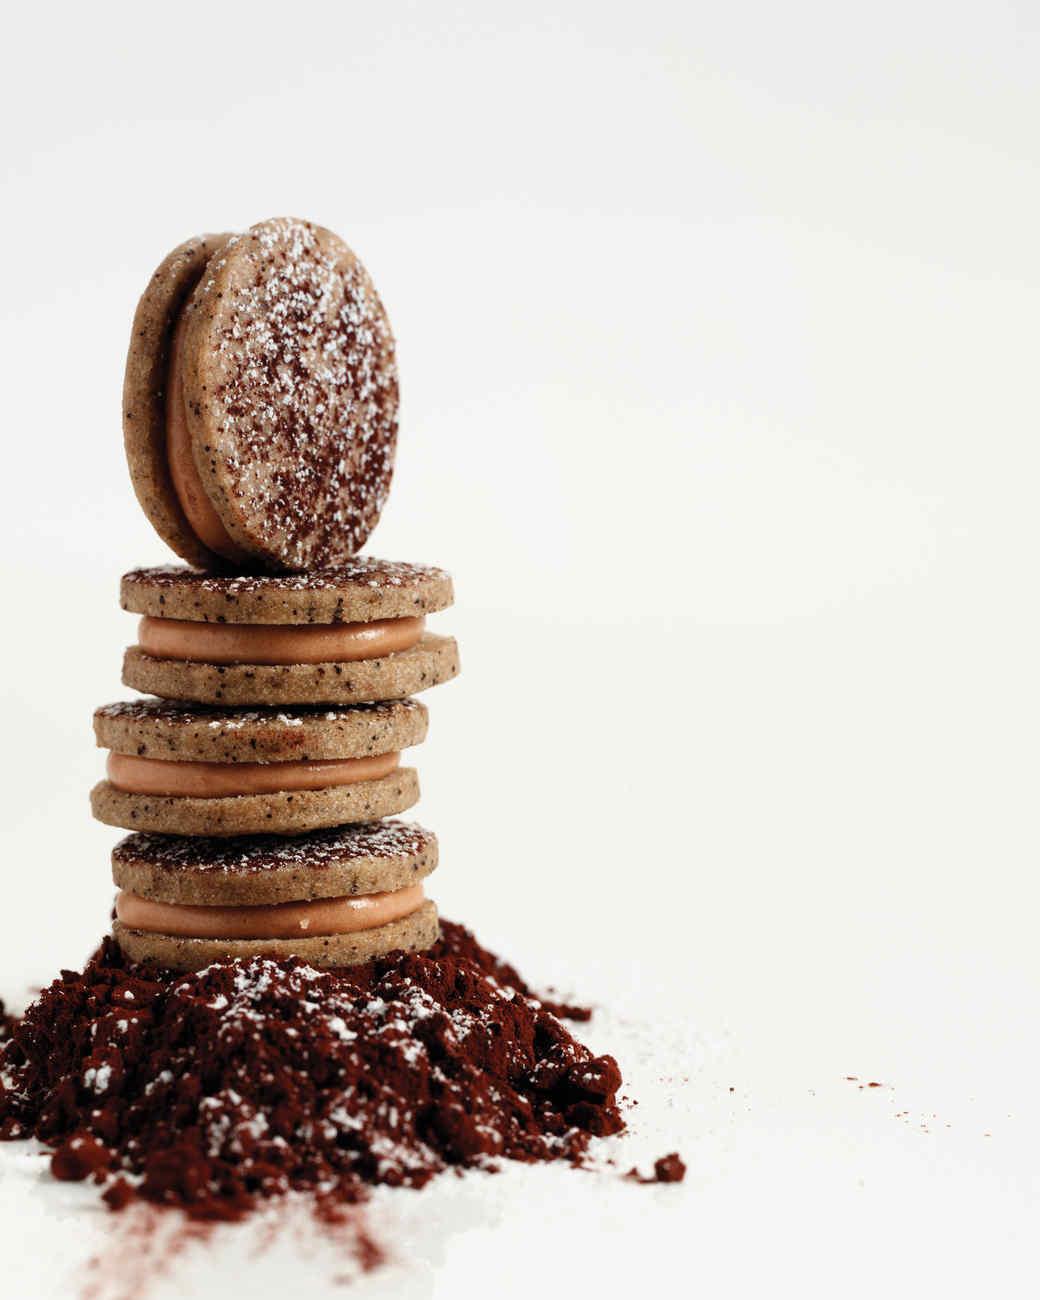 Cappuccino-Chocolate Bites